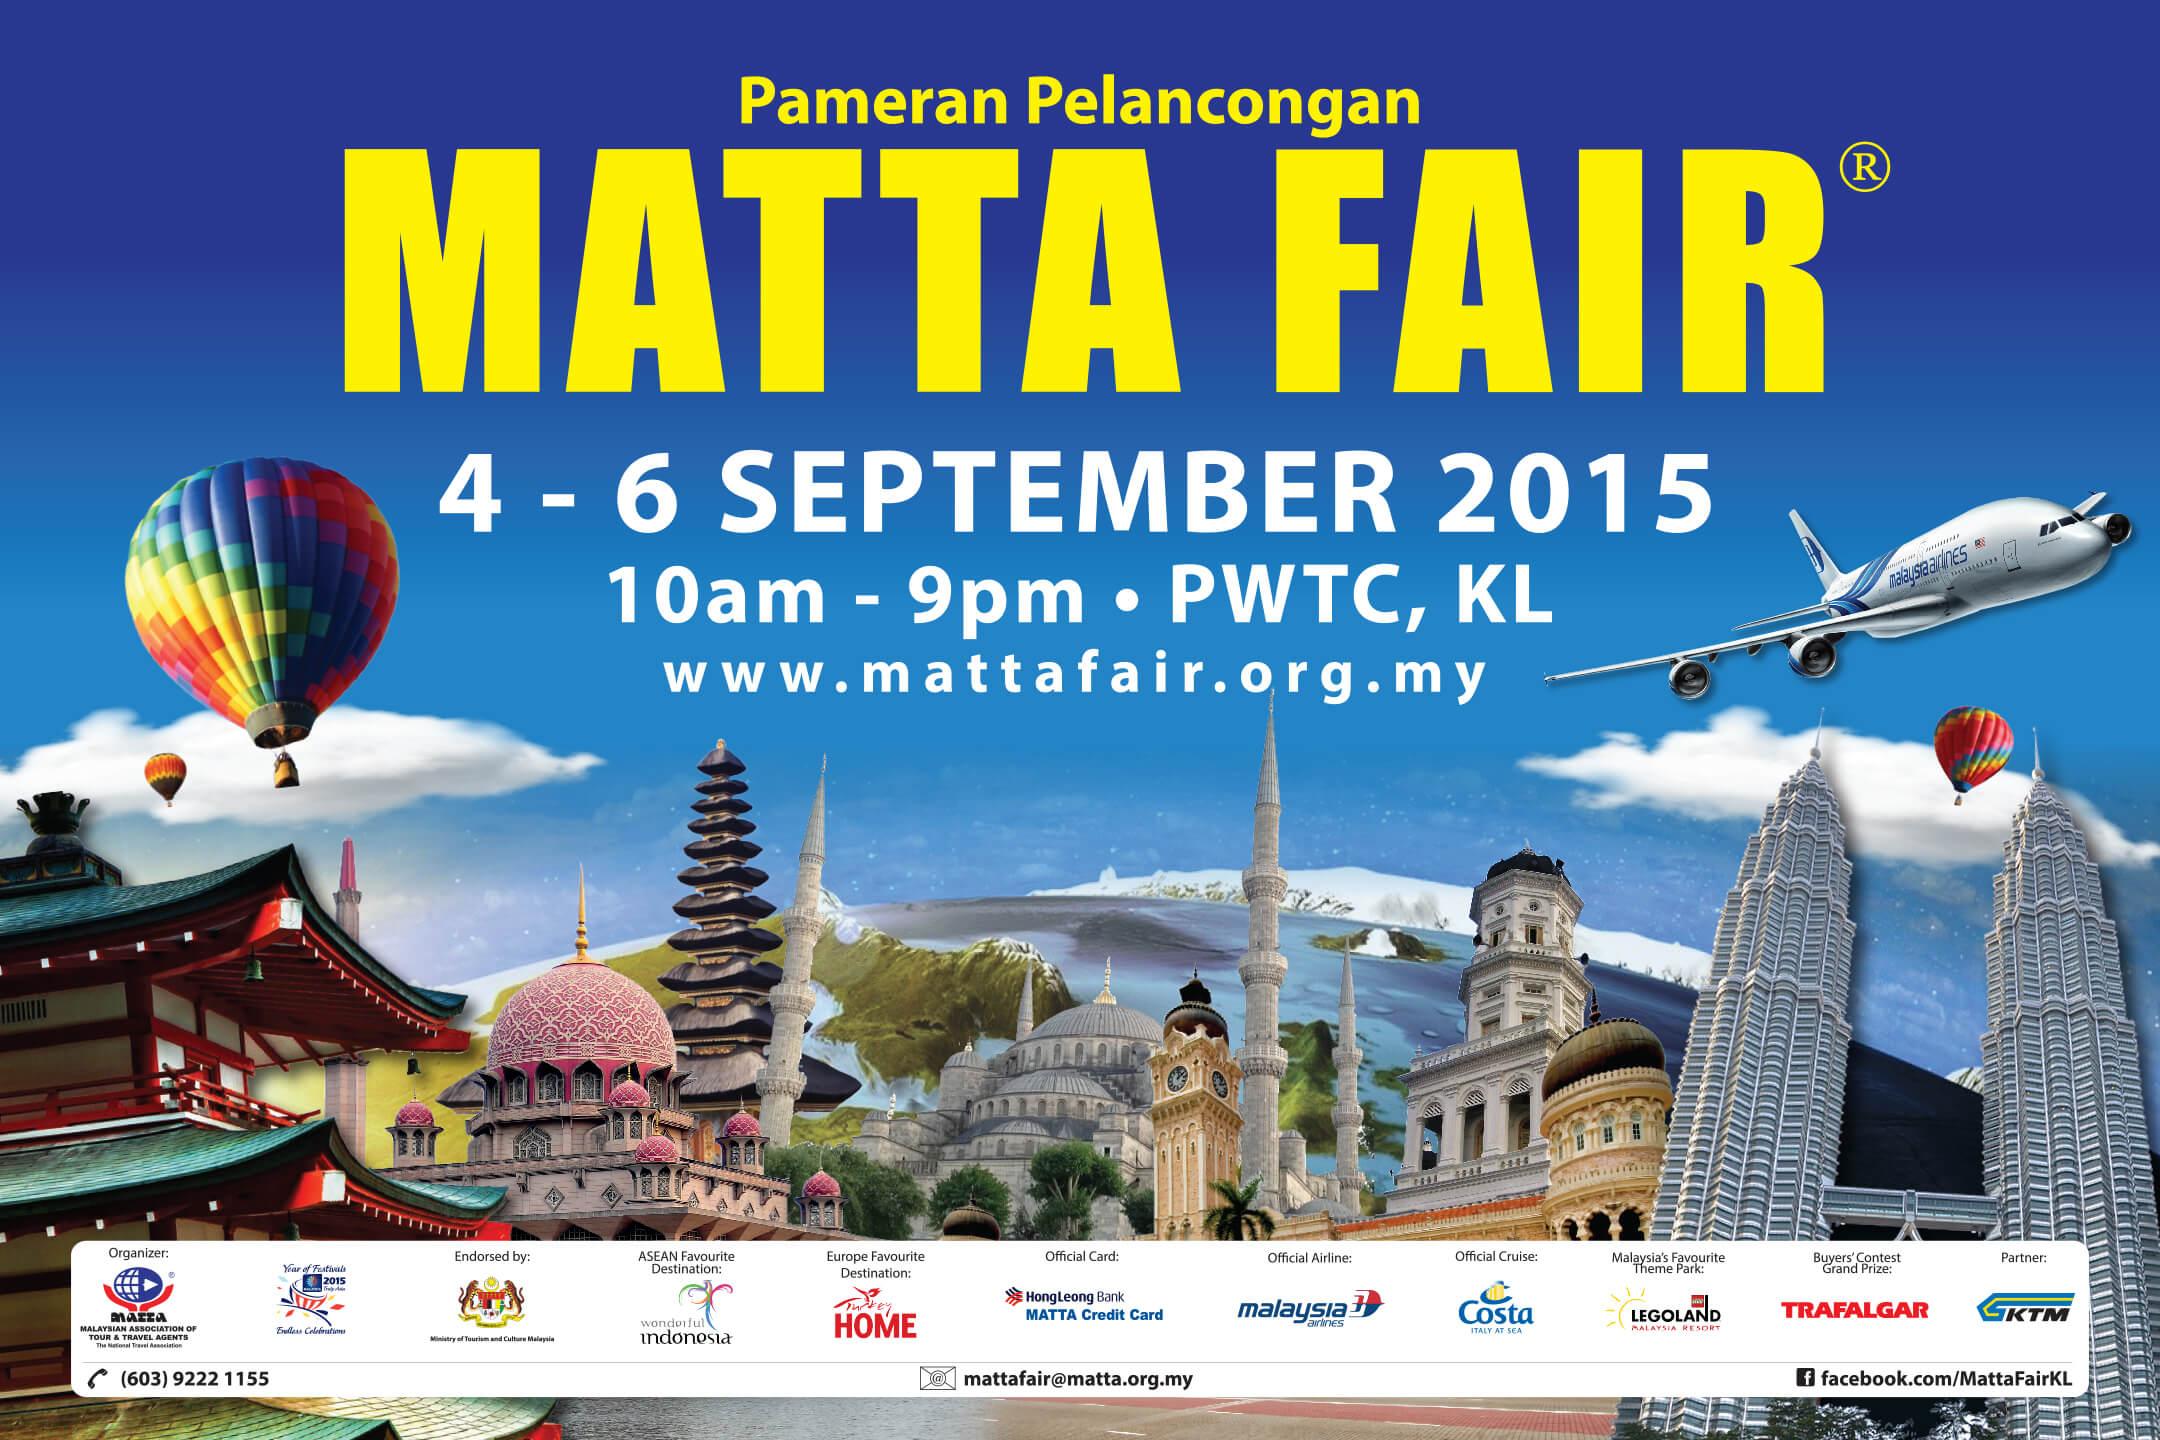 Countdown to MATTA Fair 2015 Sept 4 6 at PWTC KL PamperMy